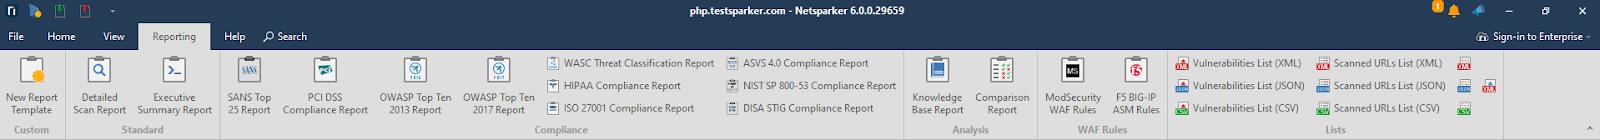 Netsparker Standard Reporting Ribbon